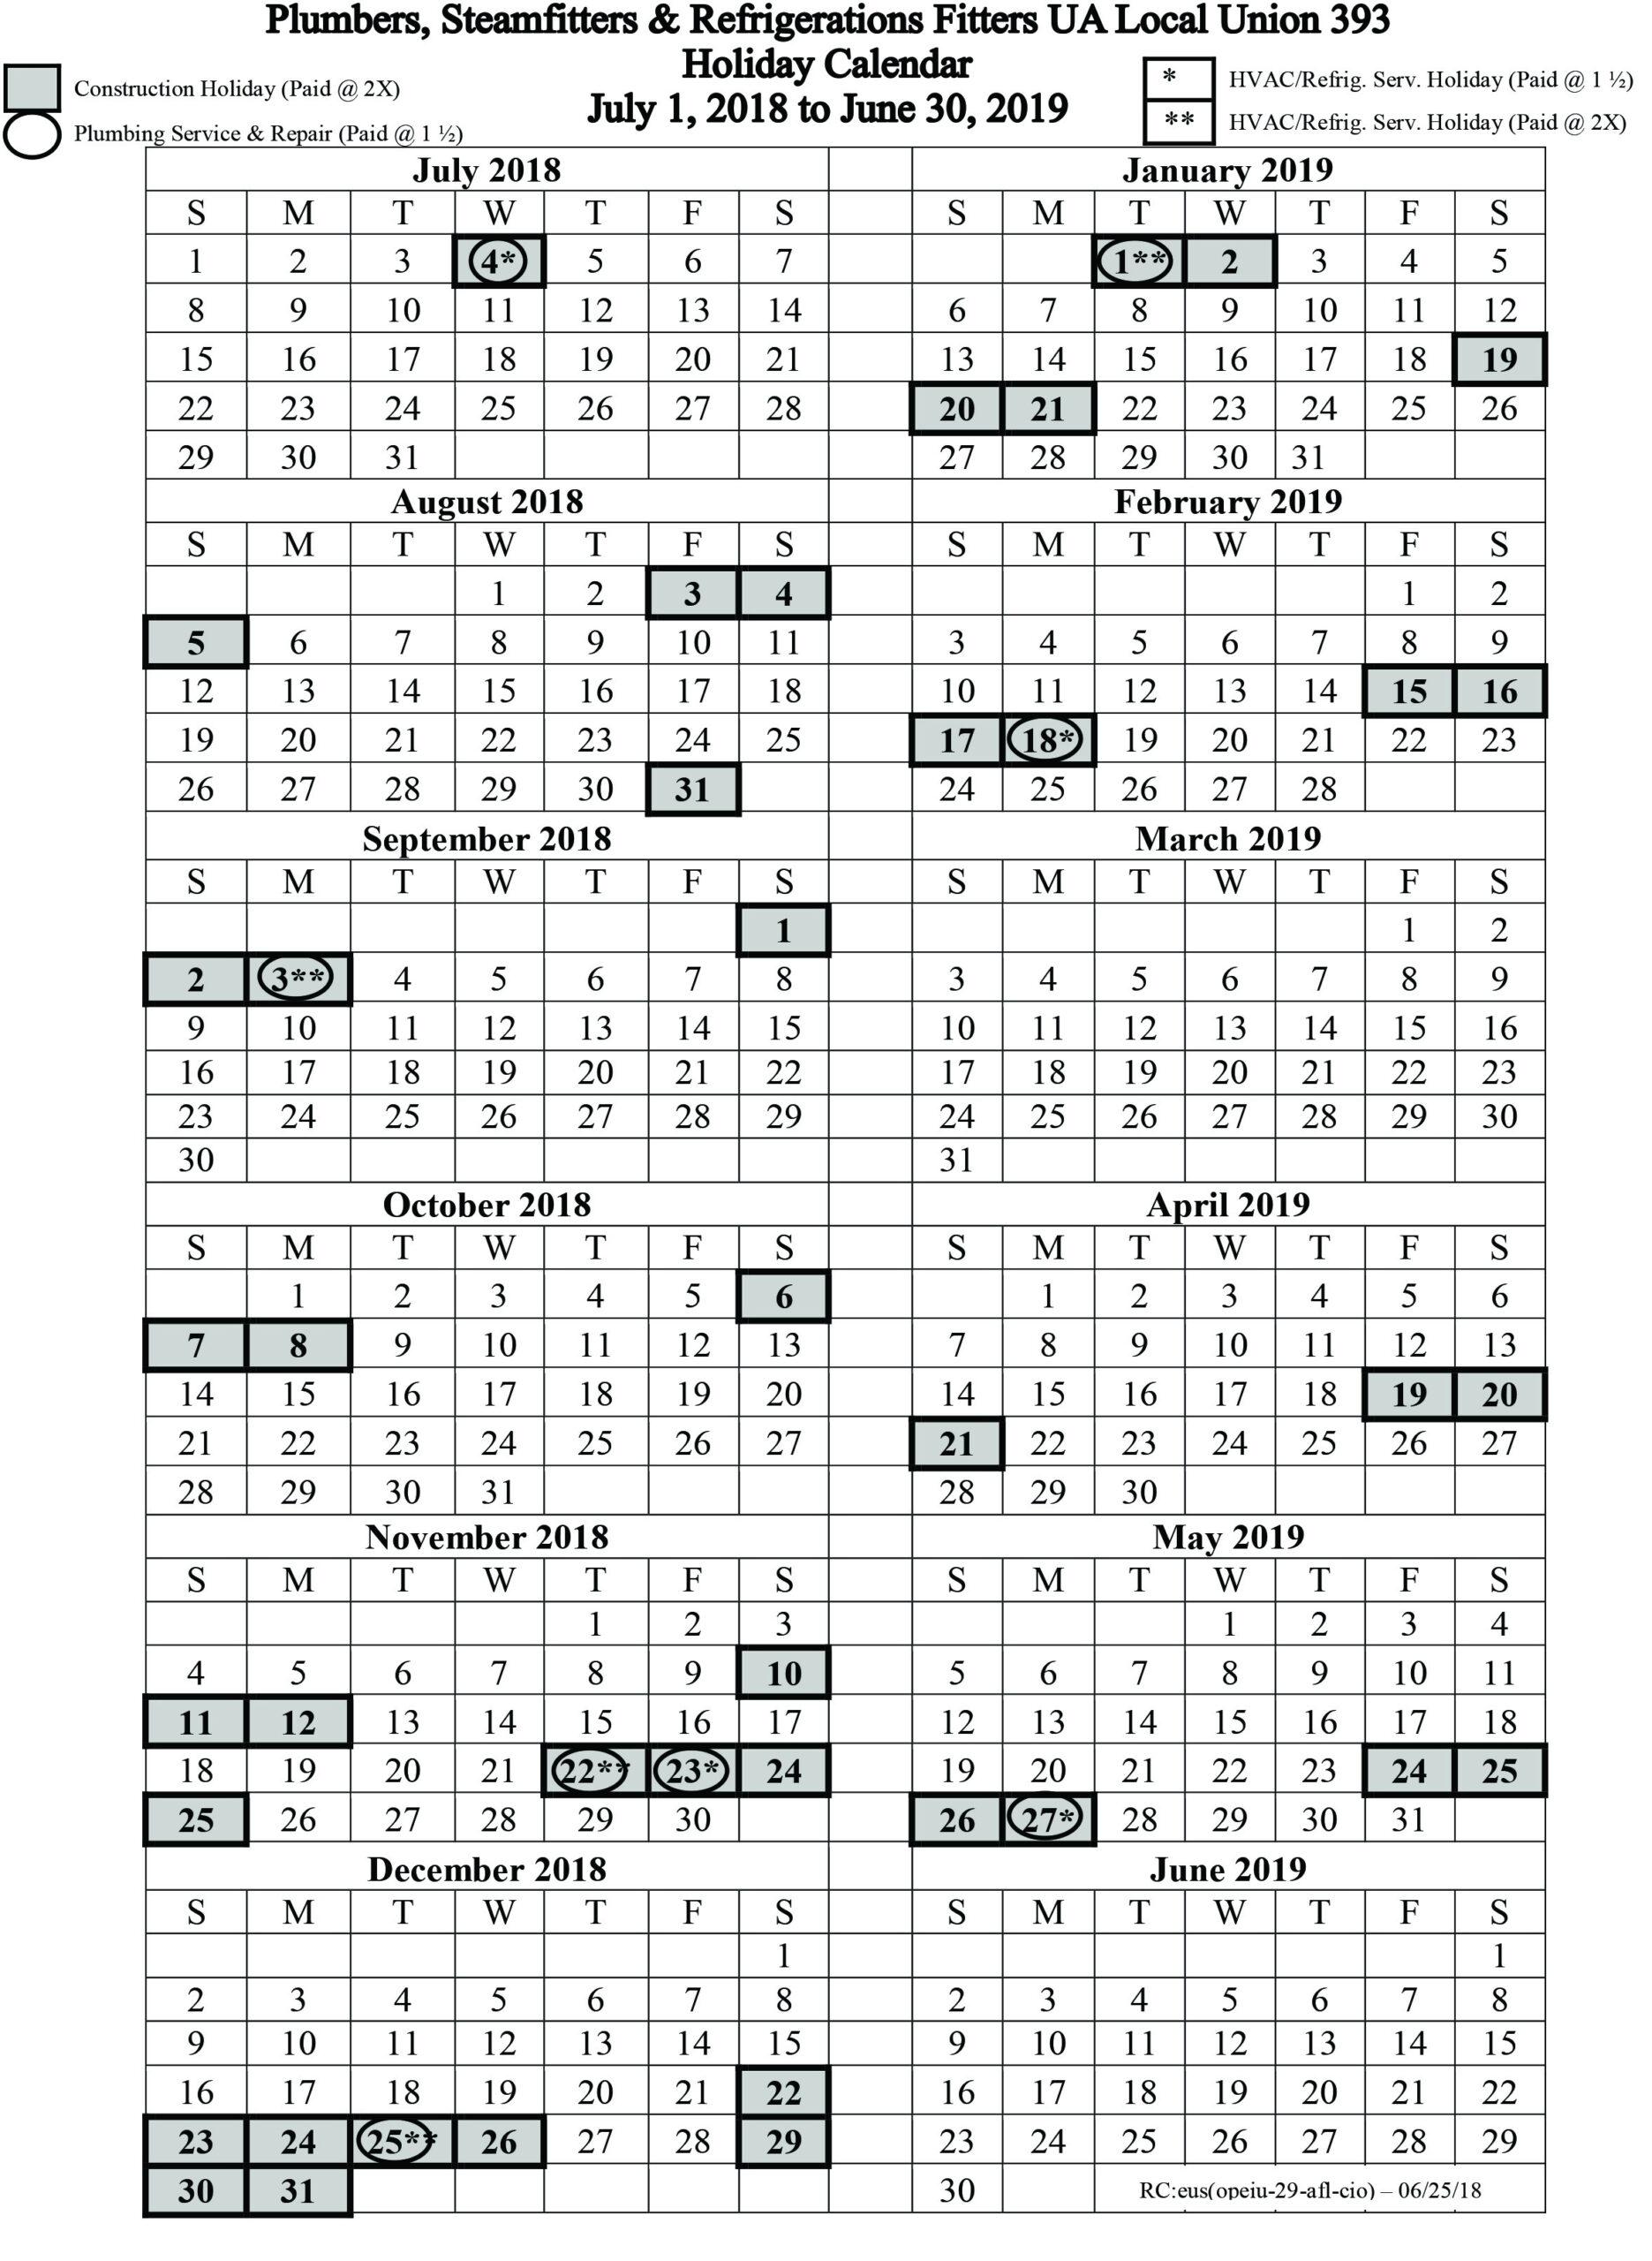 July 1, 2018 – June 30, 2019 Holiday Calendar